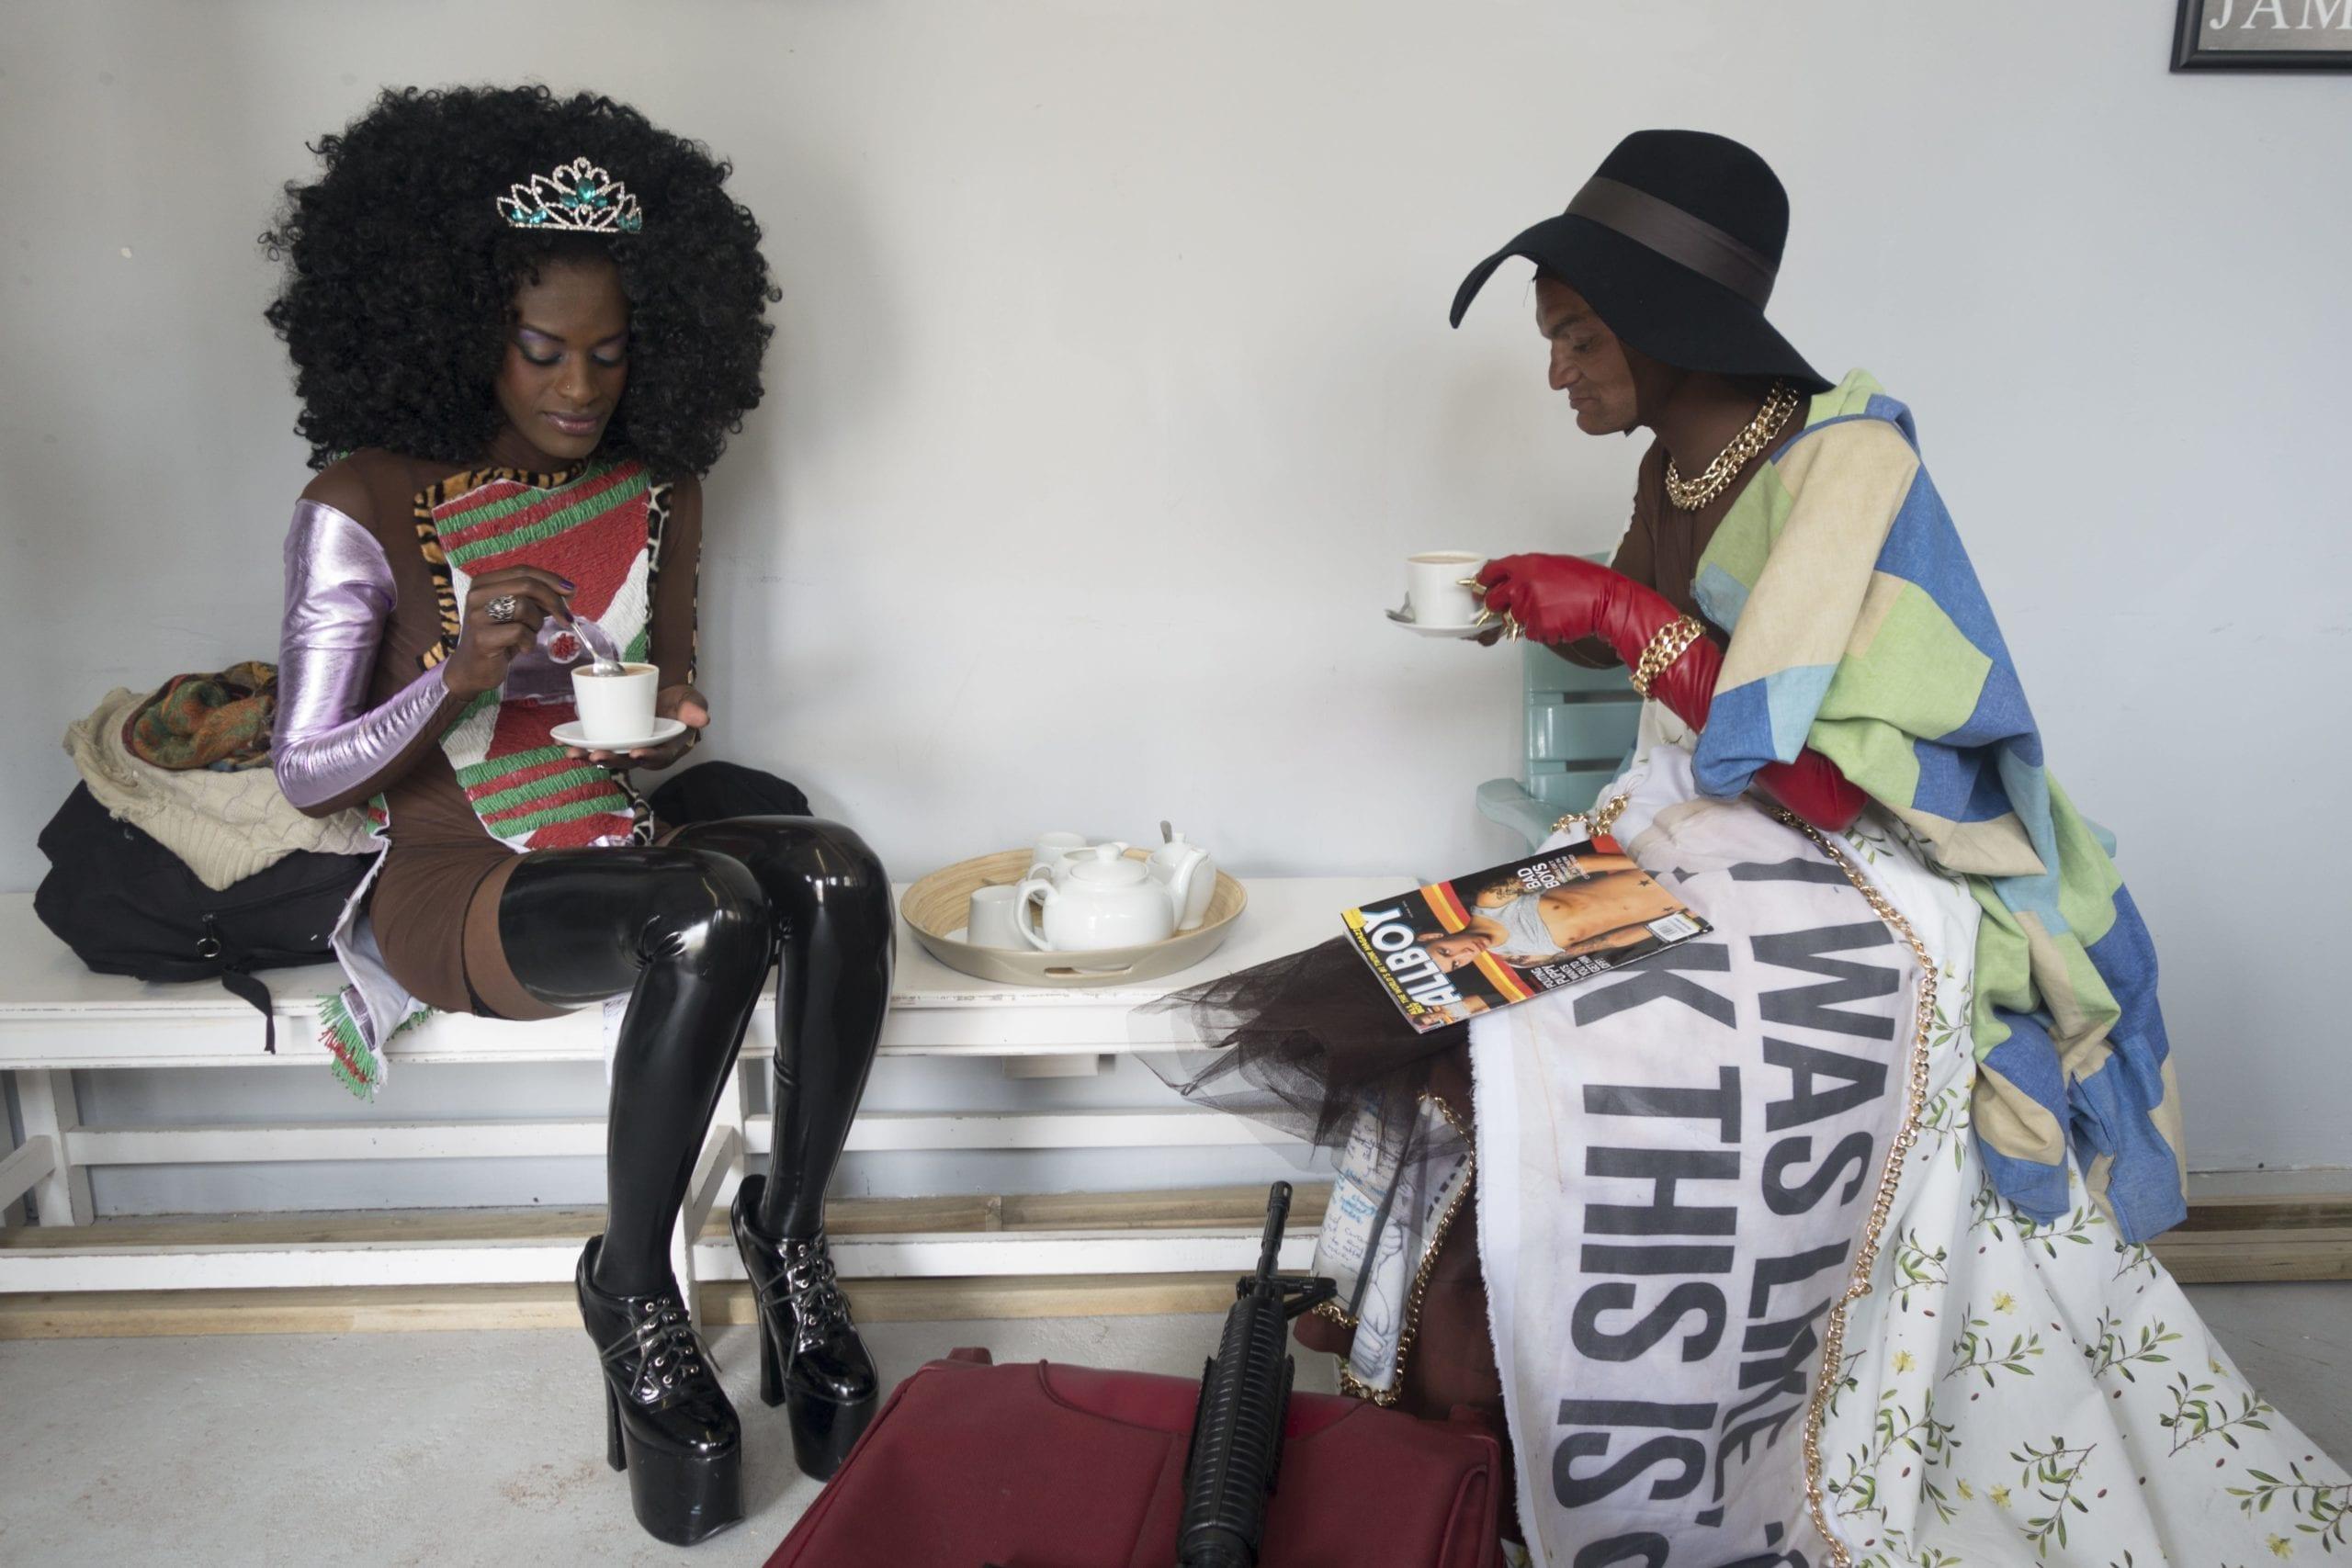 Flavinia and Sulega drinking tea backstage